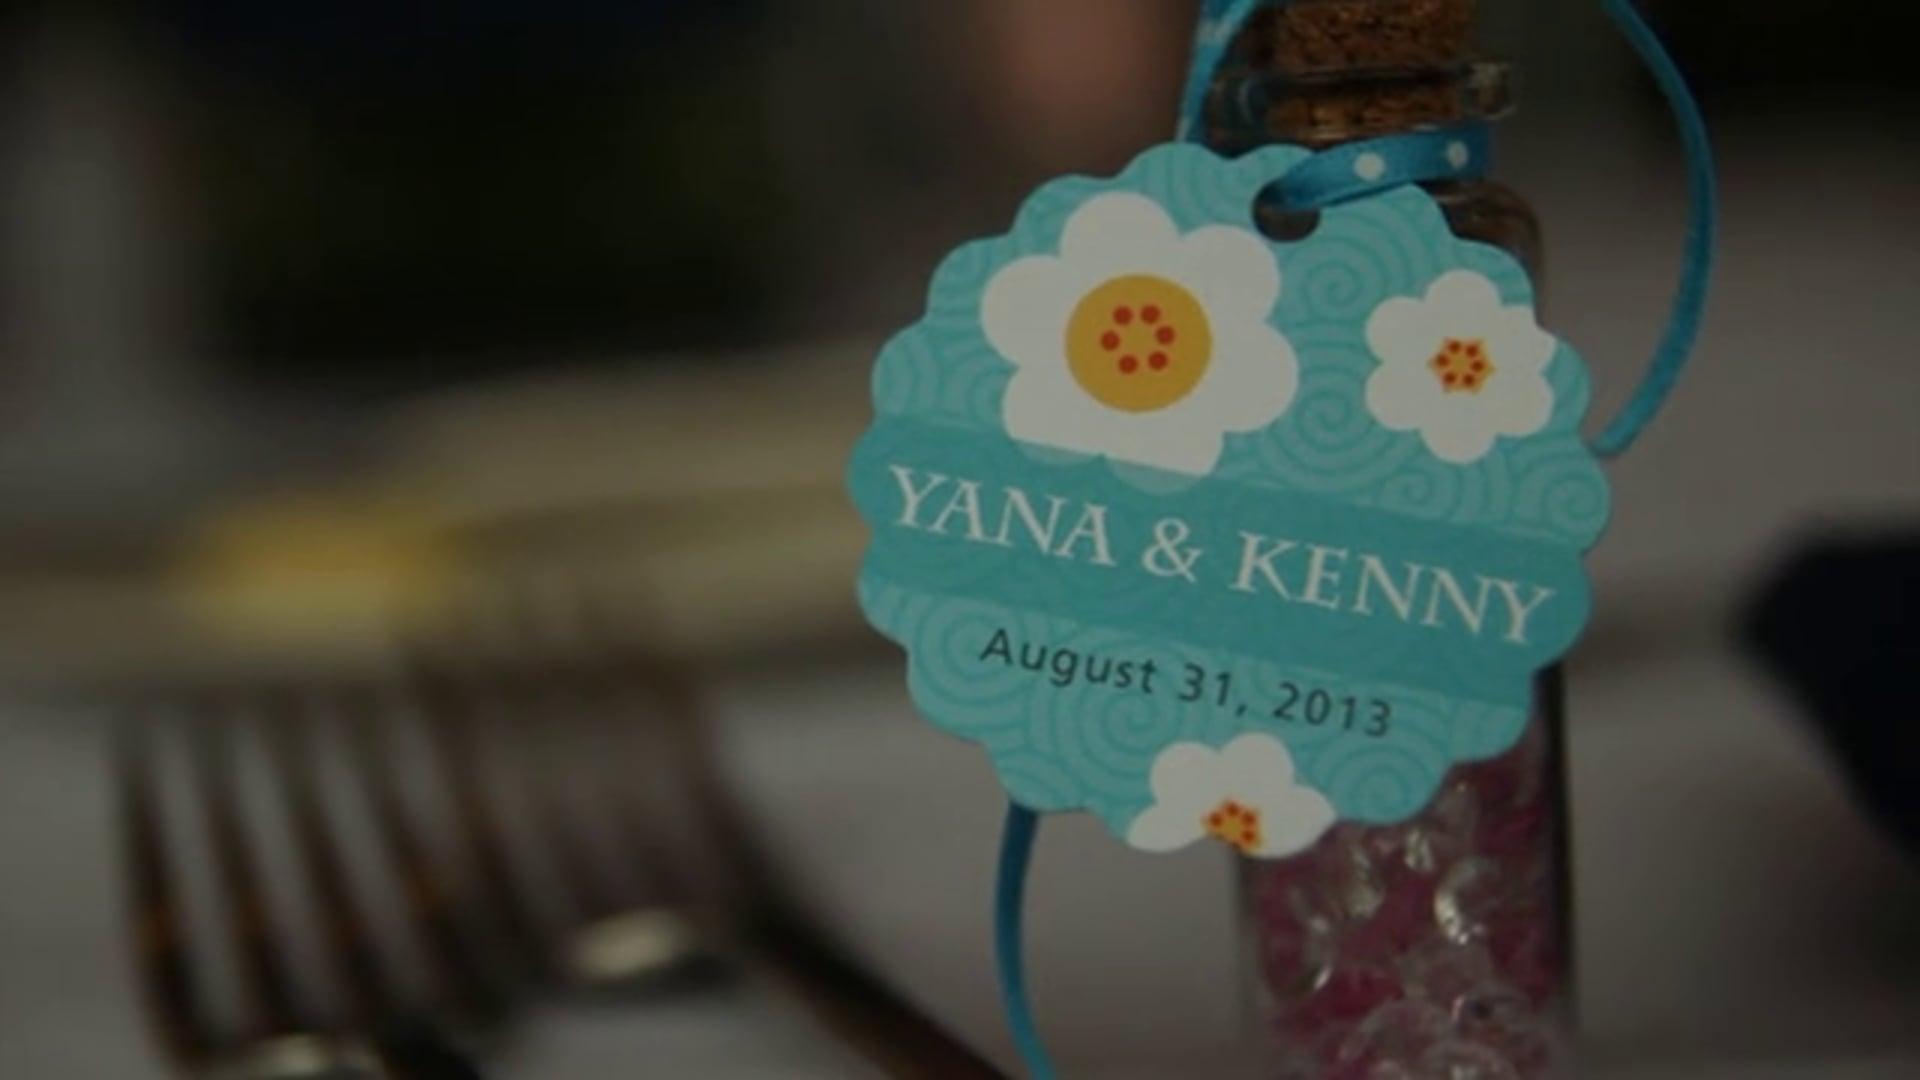 Wedding Day Highlights - Yana & Kenny